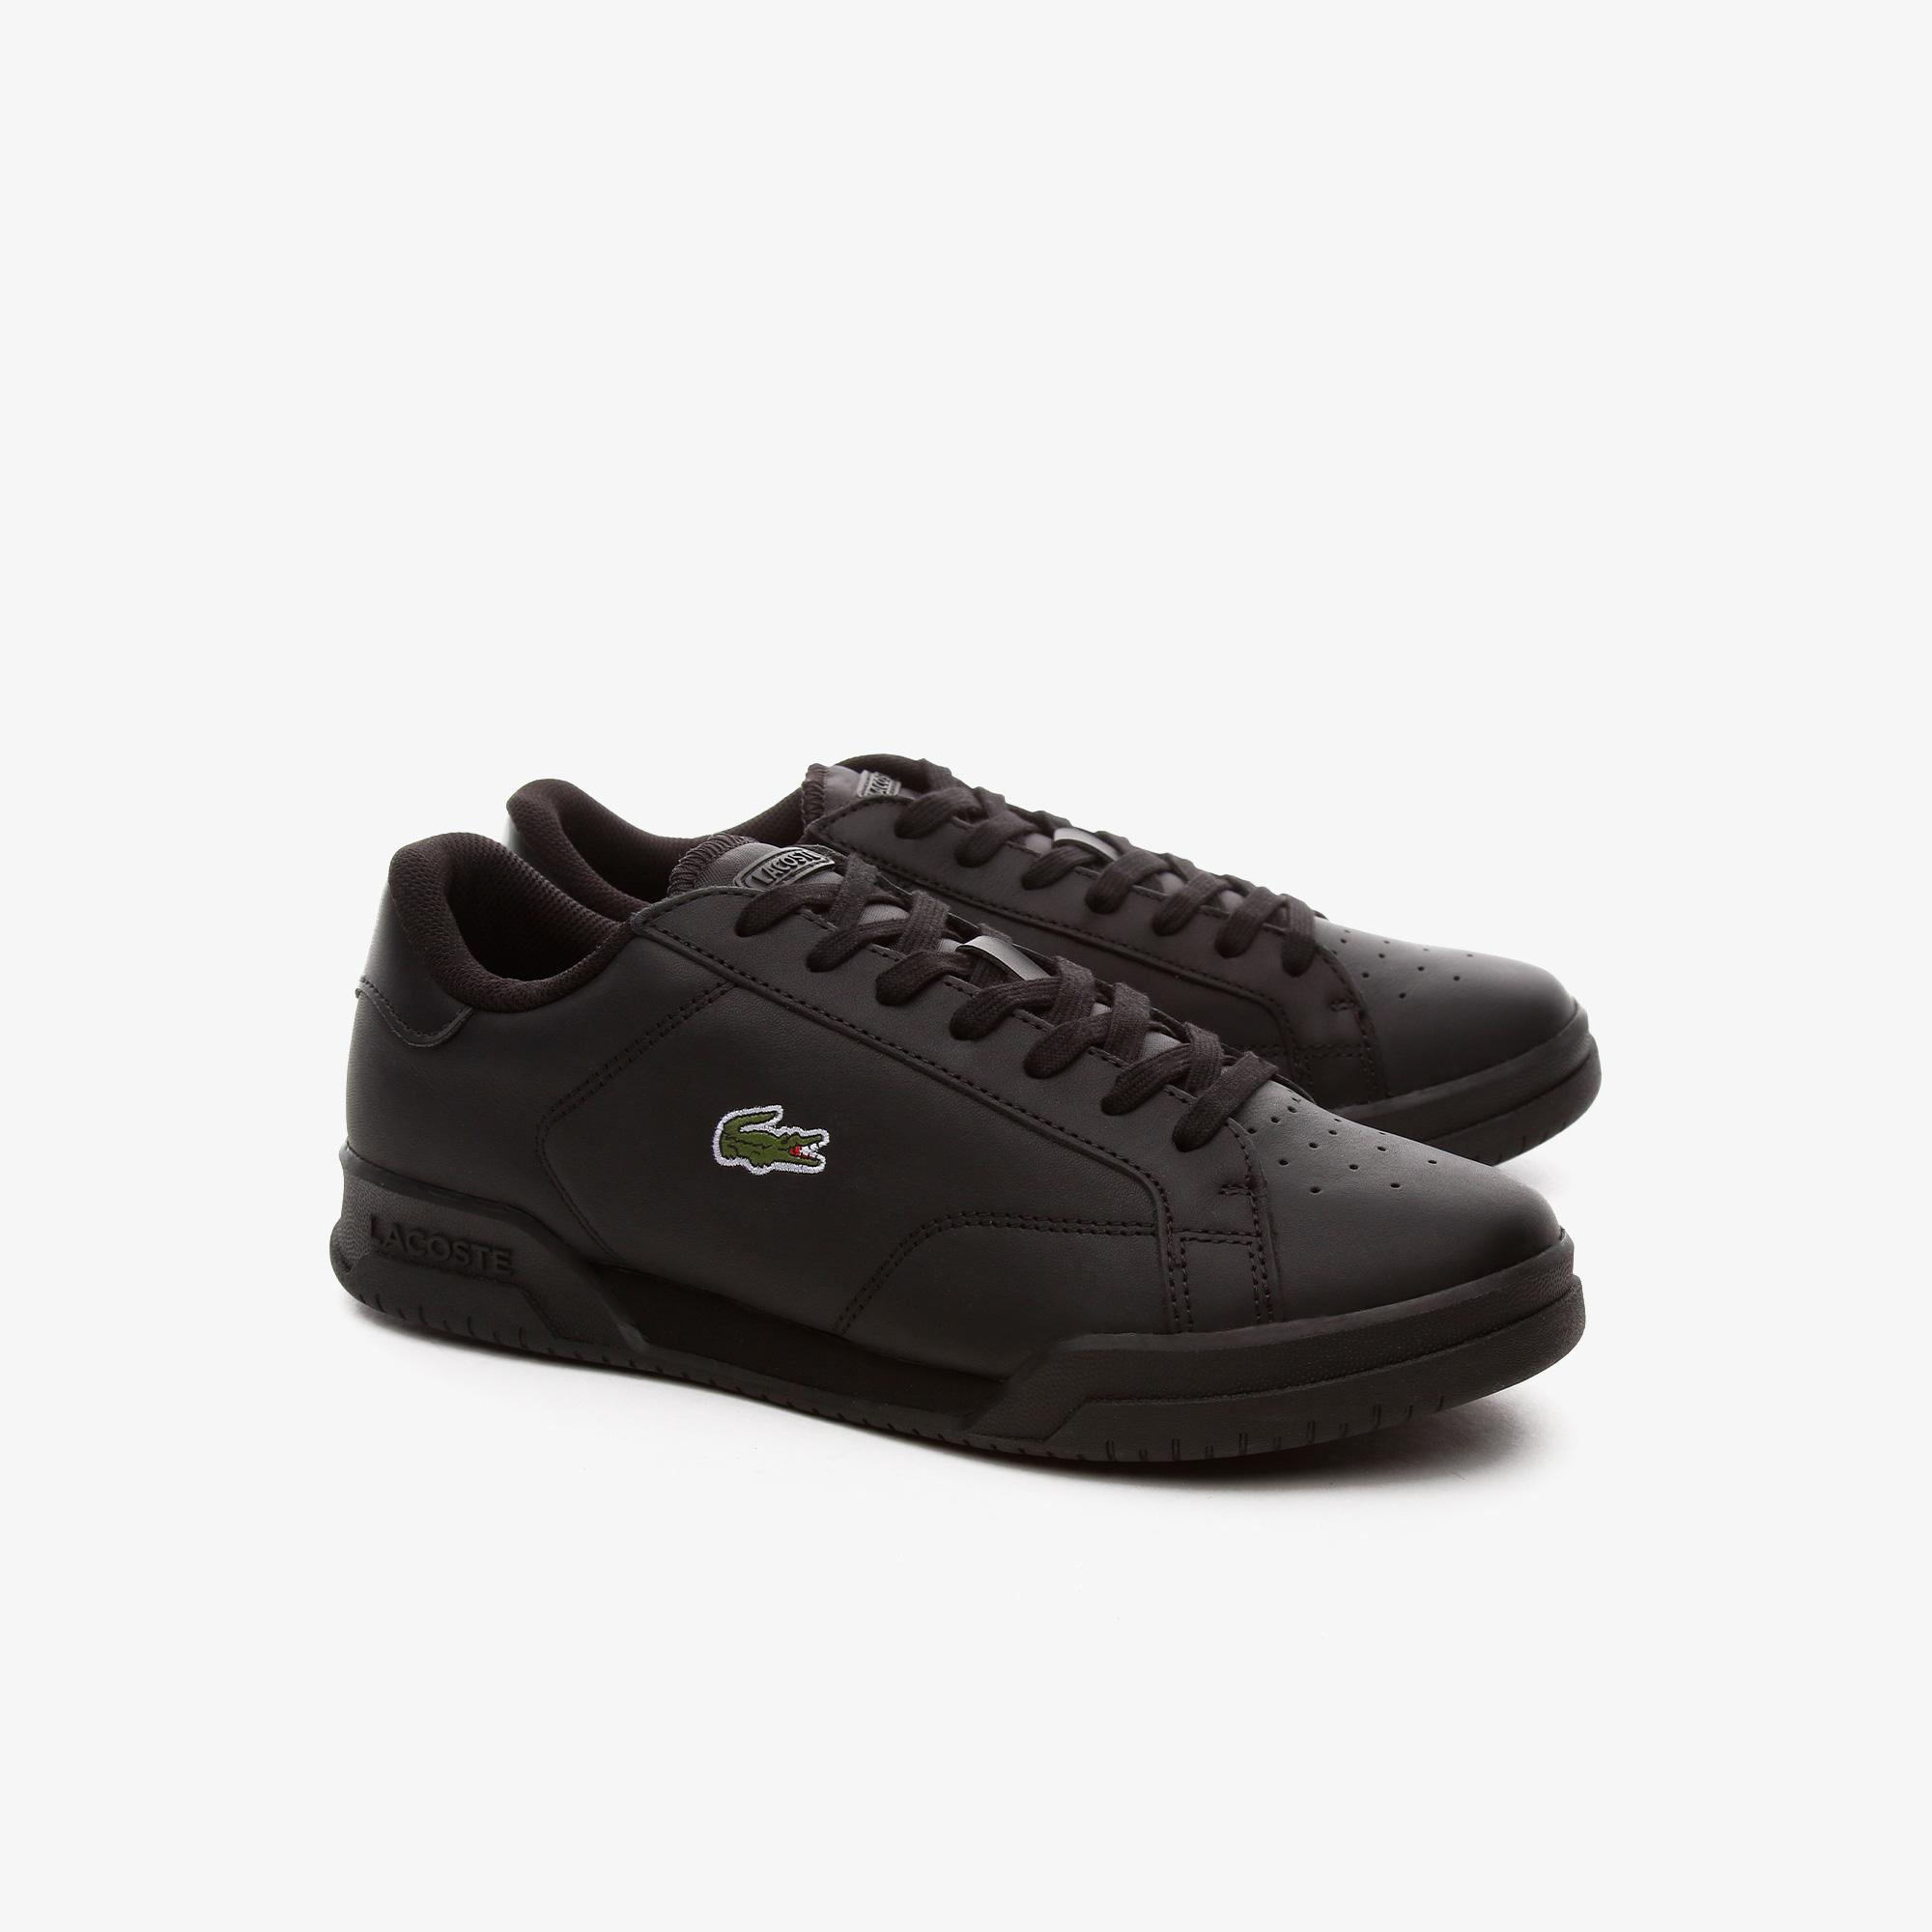 Lacoste Twin Serve 0721 2 Sma Erkek Deri Siyah Sneaker